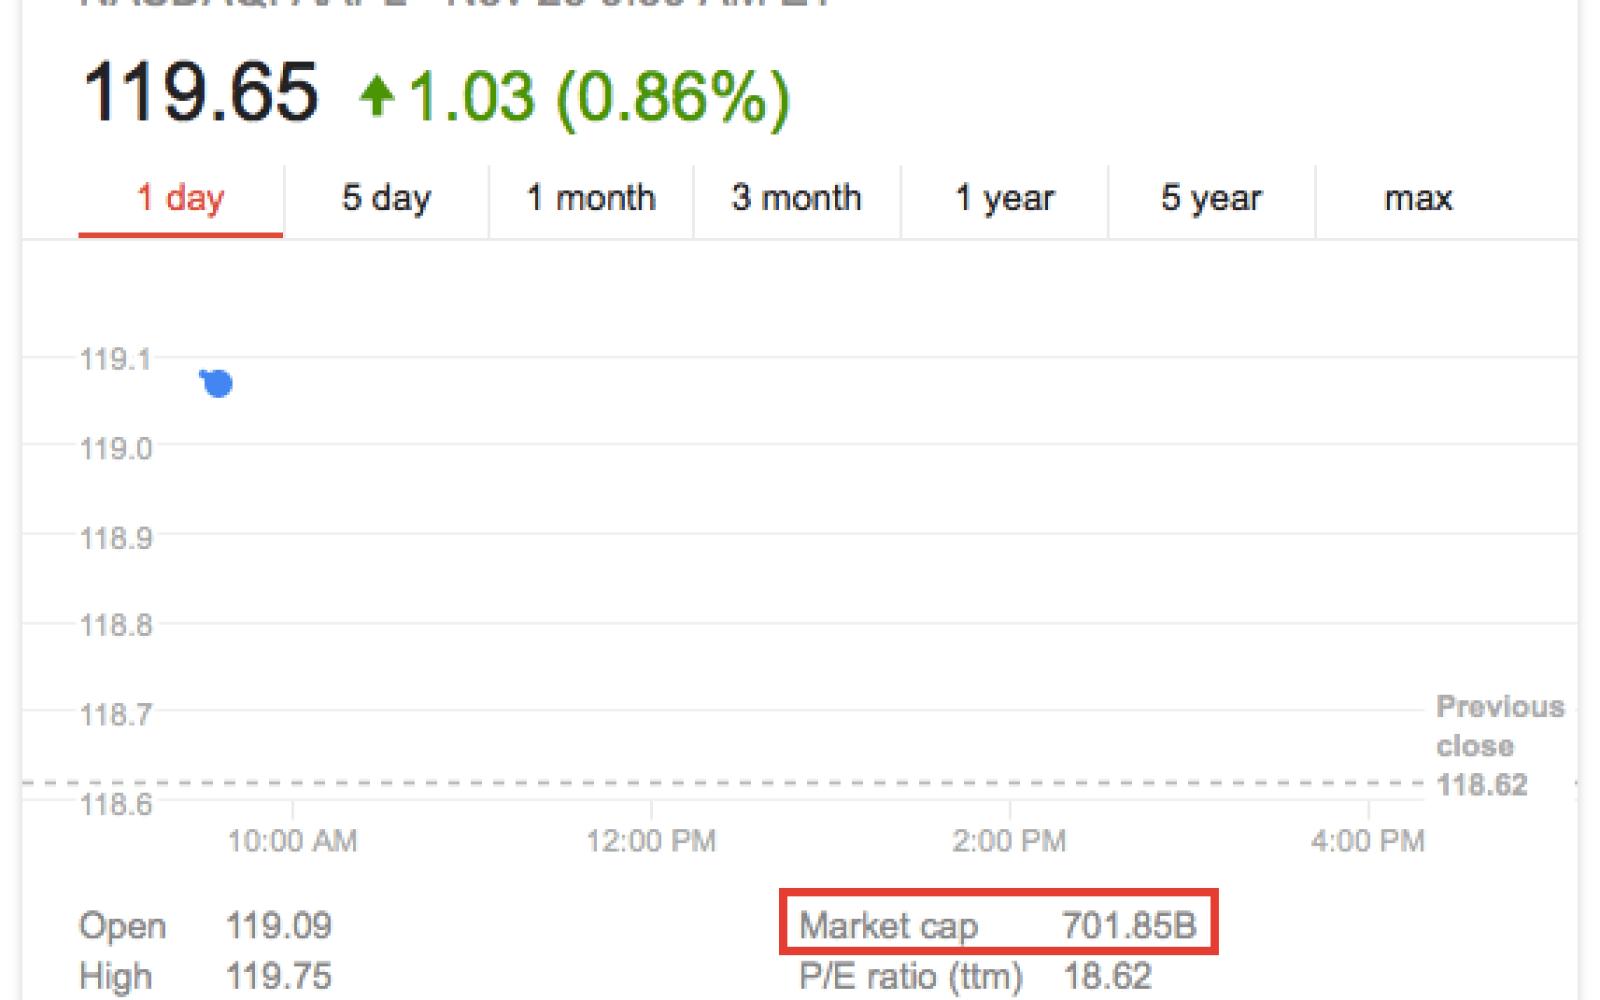 Apple Crosses 700 Billion Market Cap Milestone Stock Price Up 50